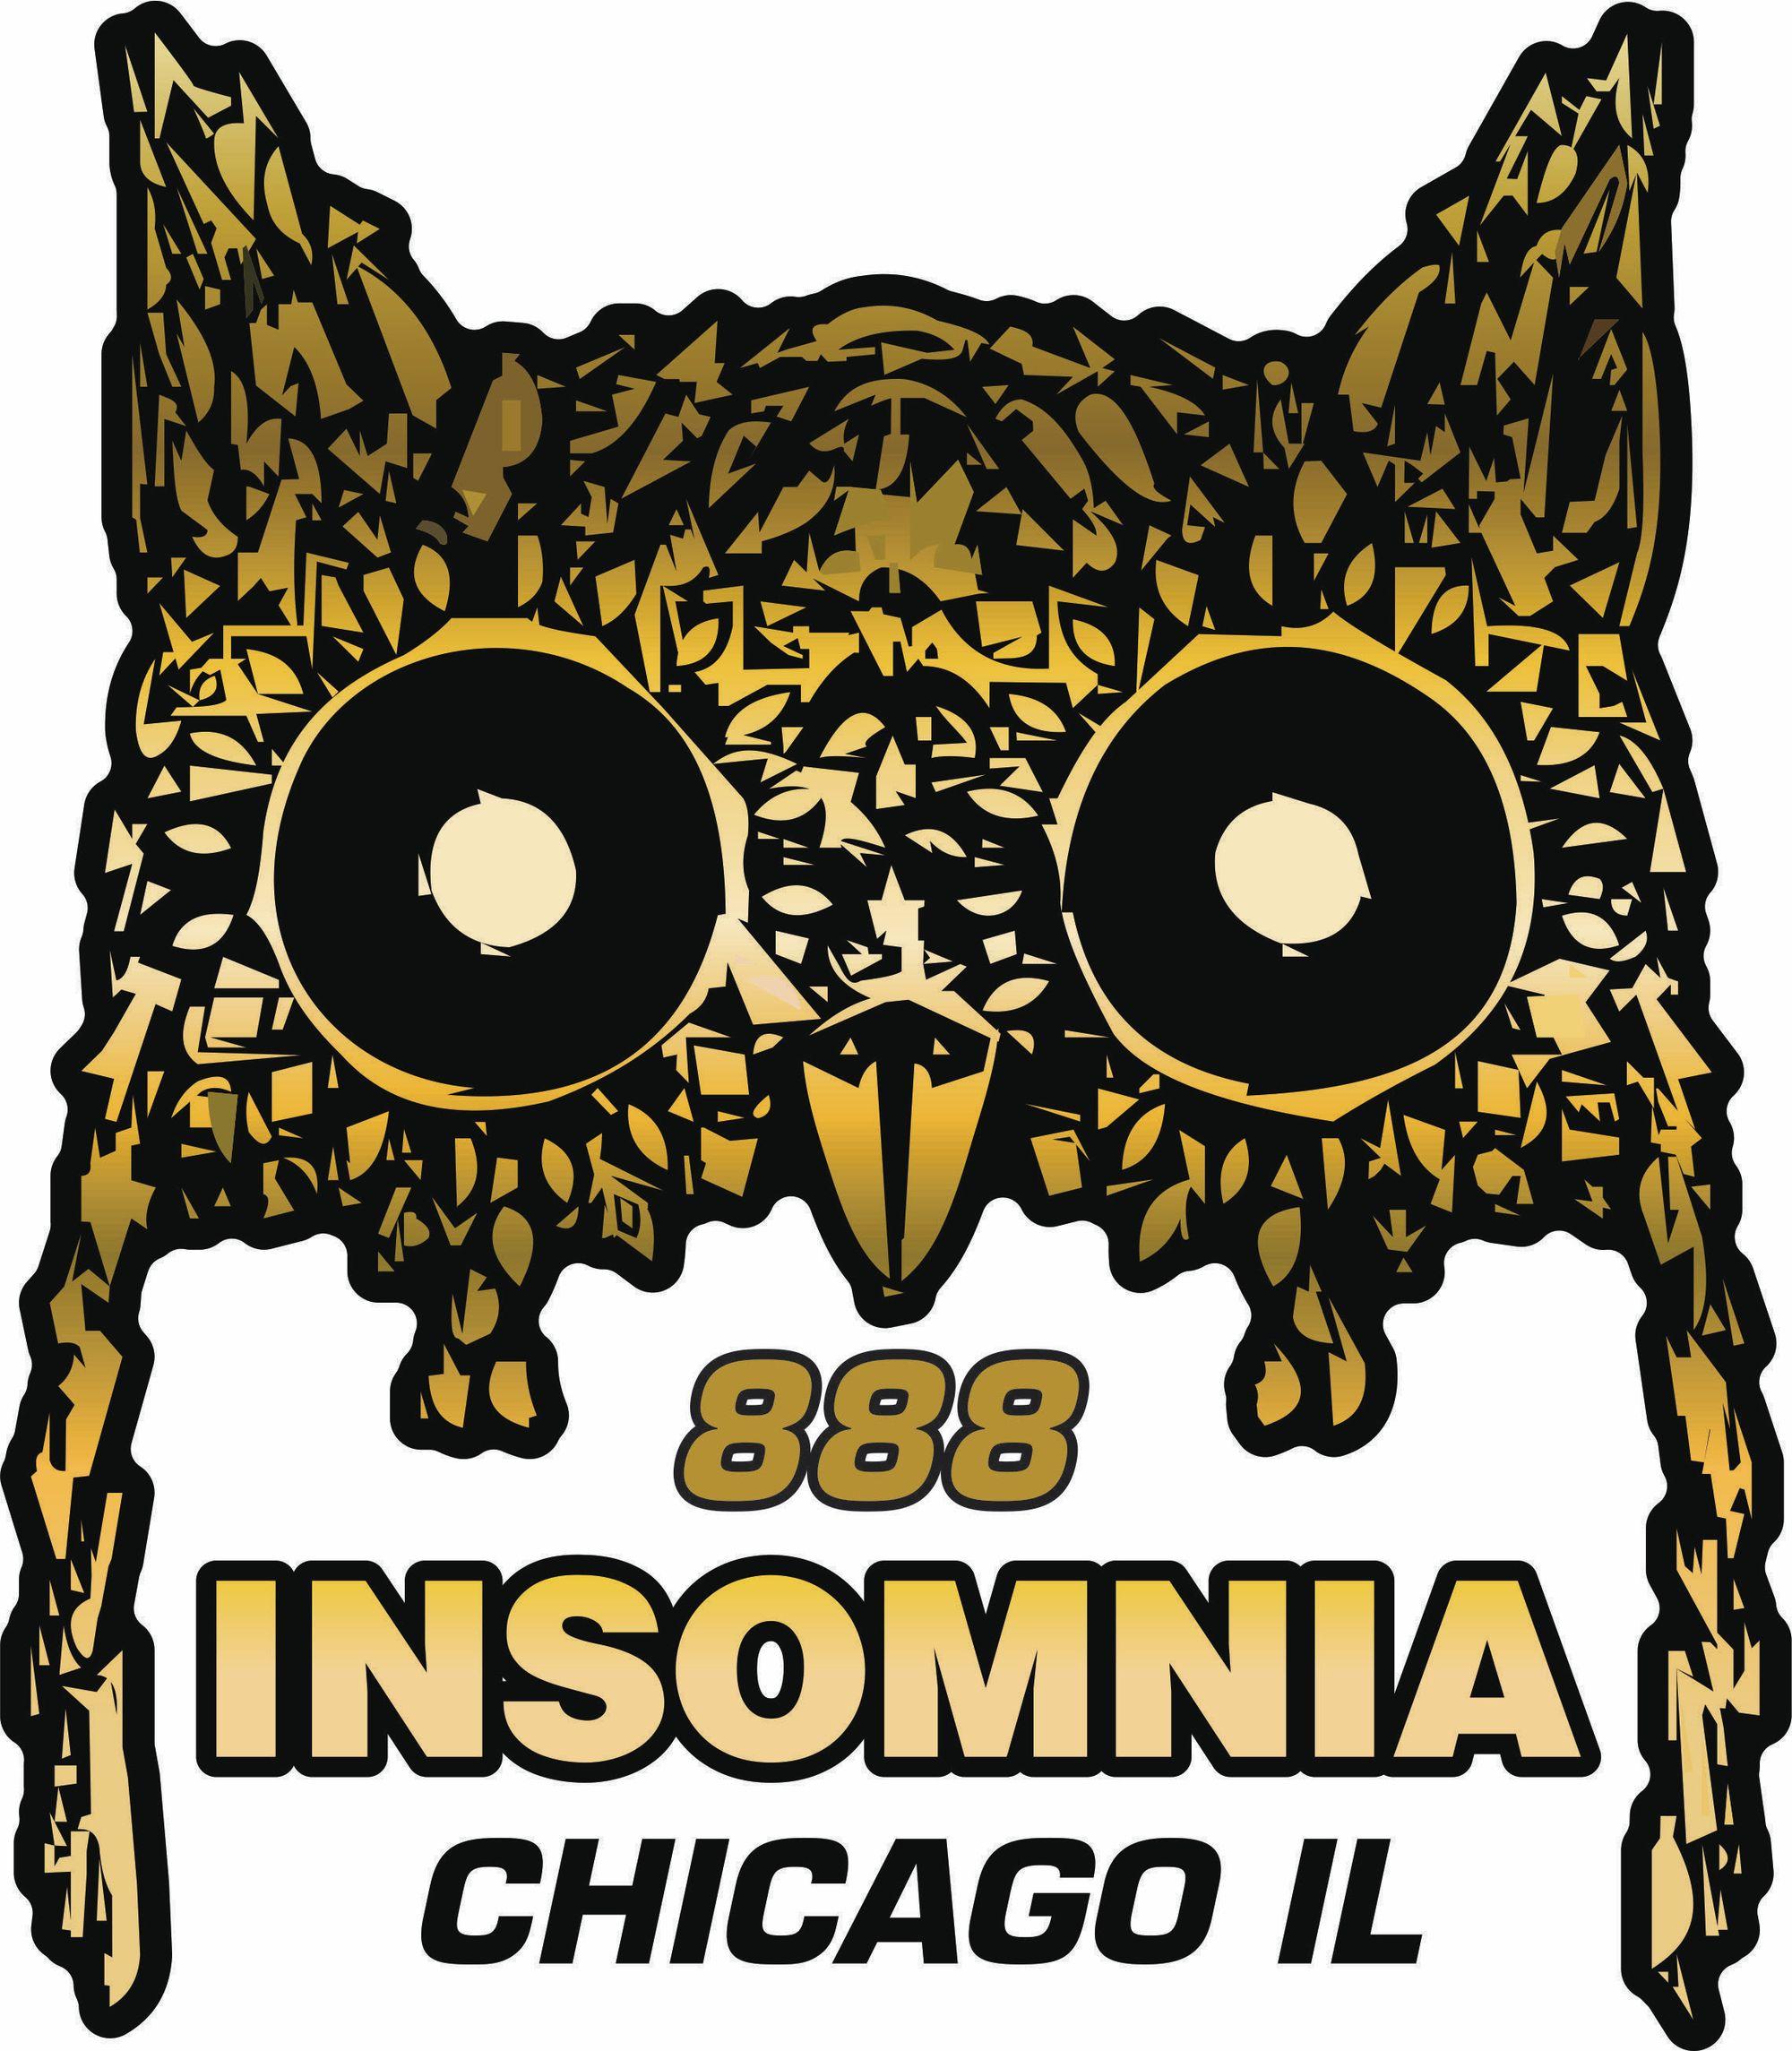 Insomnia 888 Corp